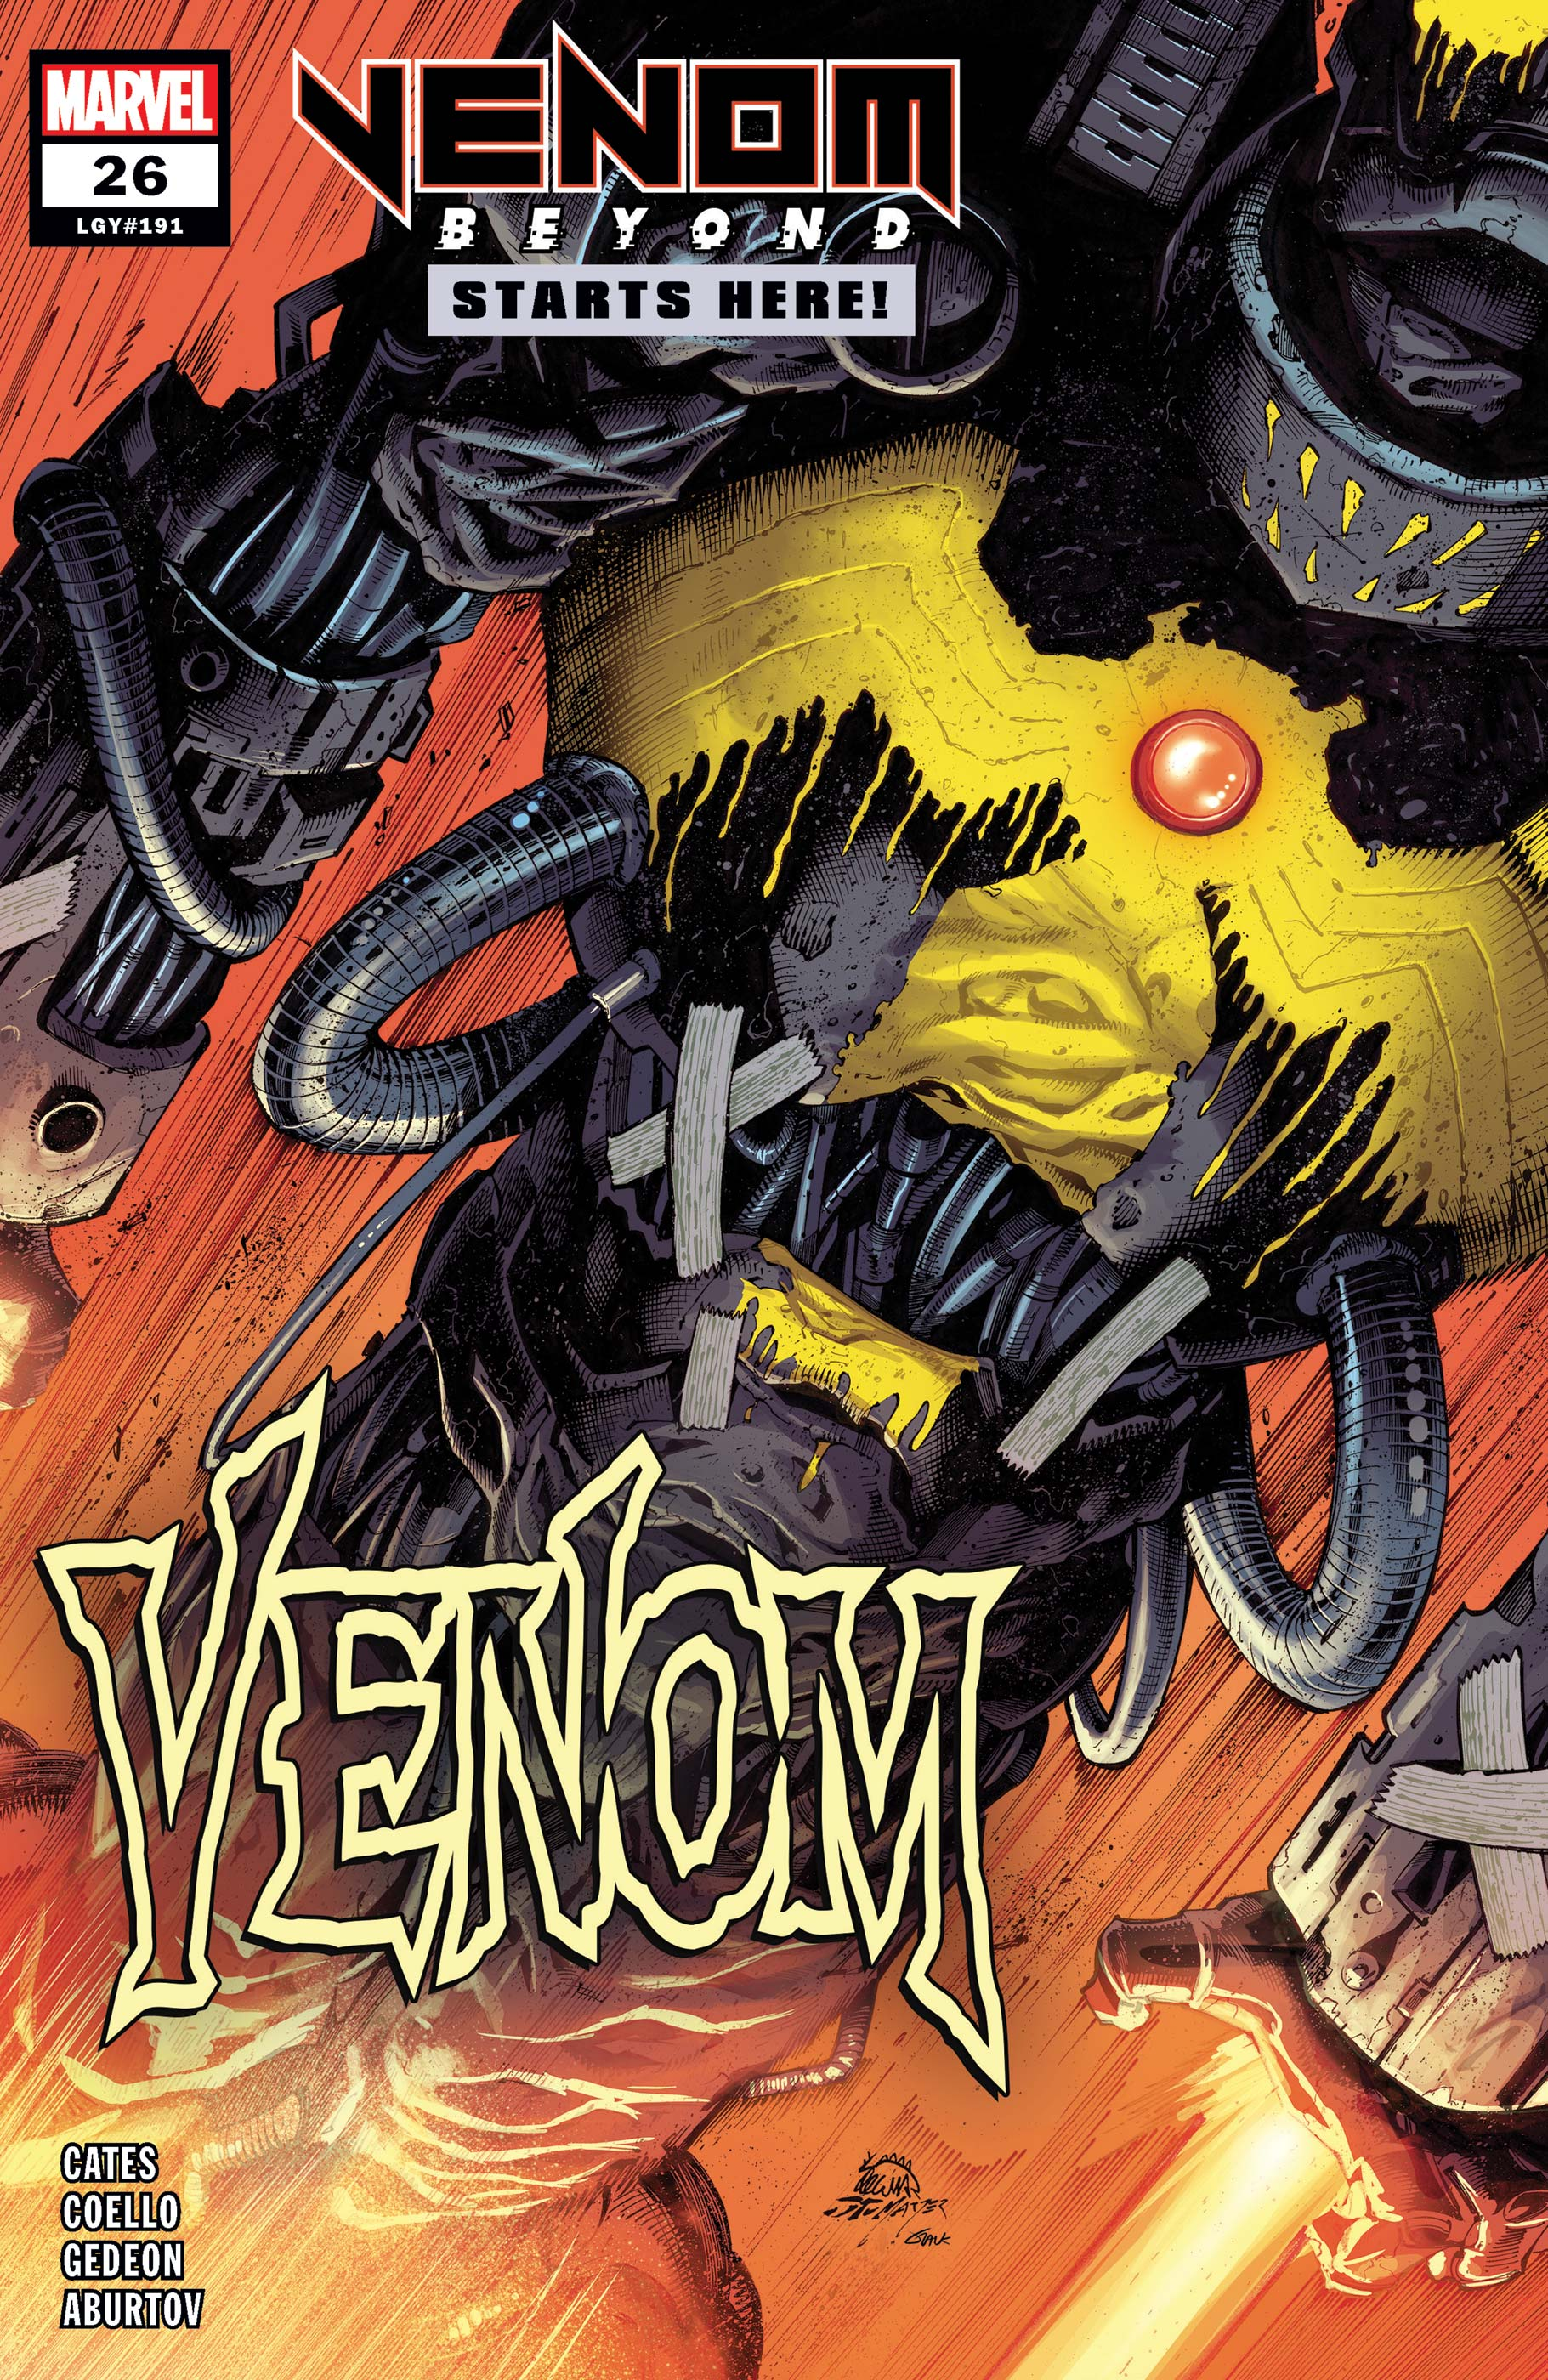 Venom (2018) #26